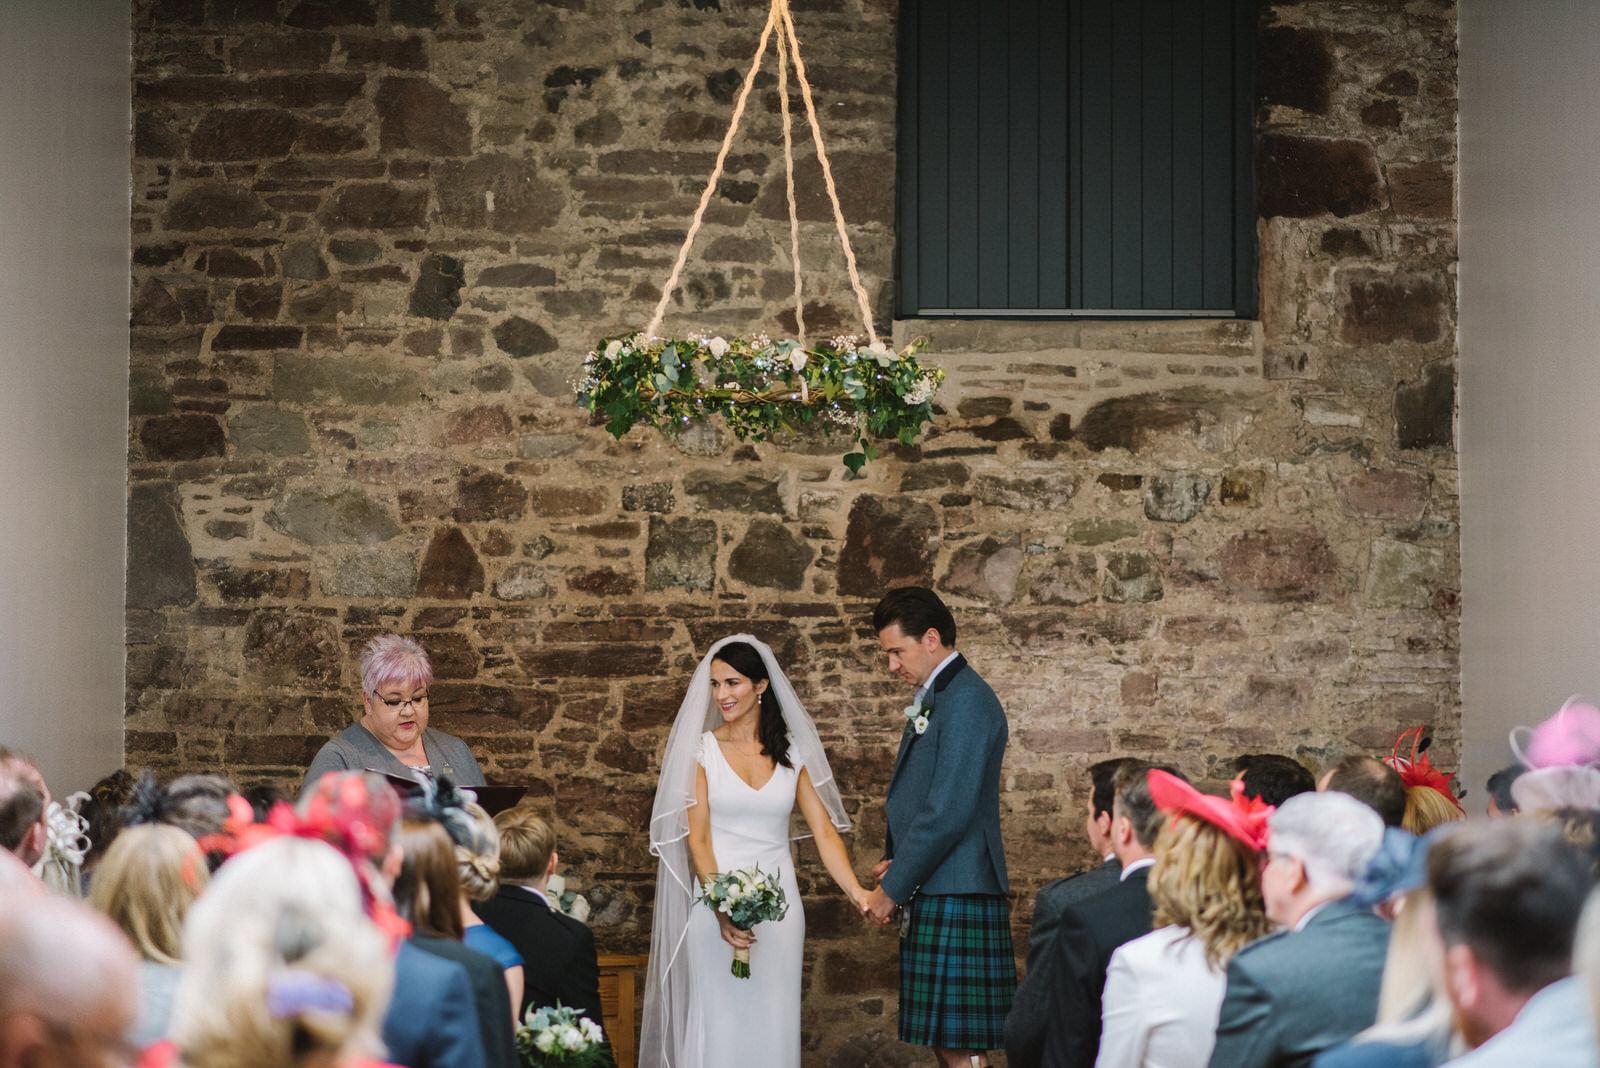 024-GUARDSWELL-FARM-WEDDING-ALTERNATIVE-SCOTTISH-WEDDING-PHOTOGRAPHER-SCOTTISH-WEDDING-DESTINATION-WEDDING-PHOTOGRAPHER.JPG